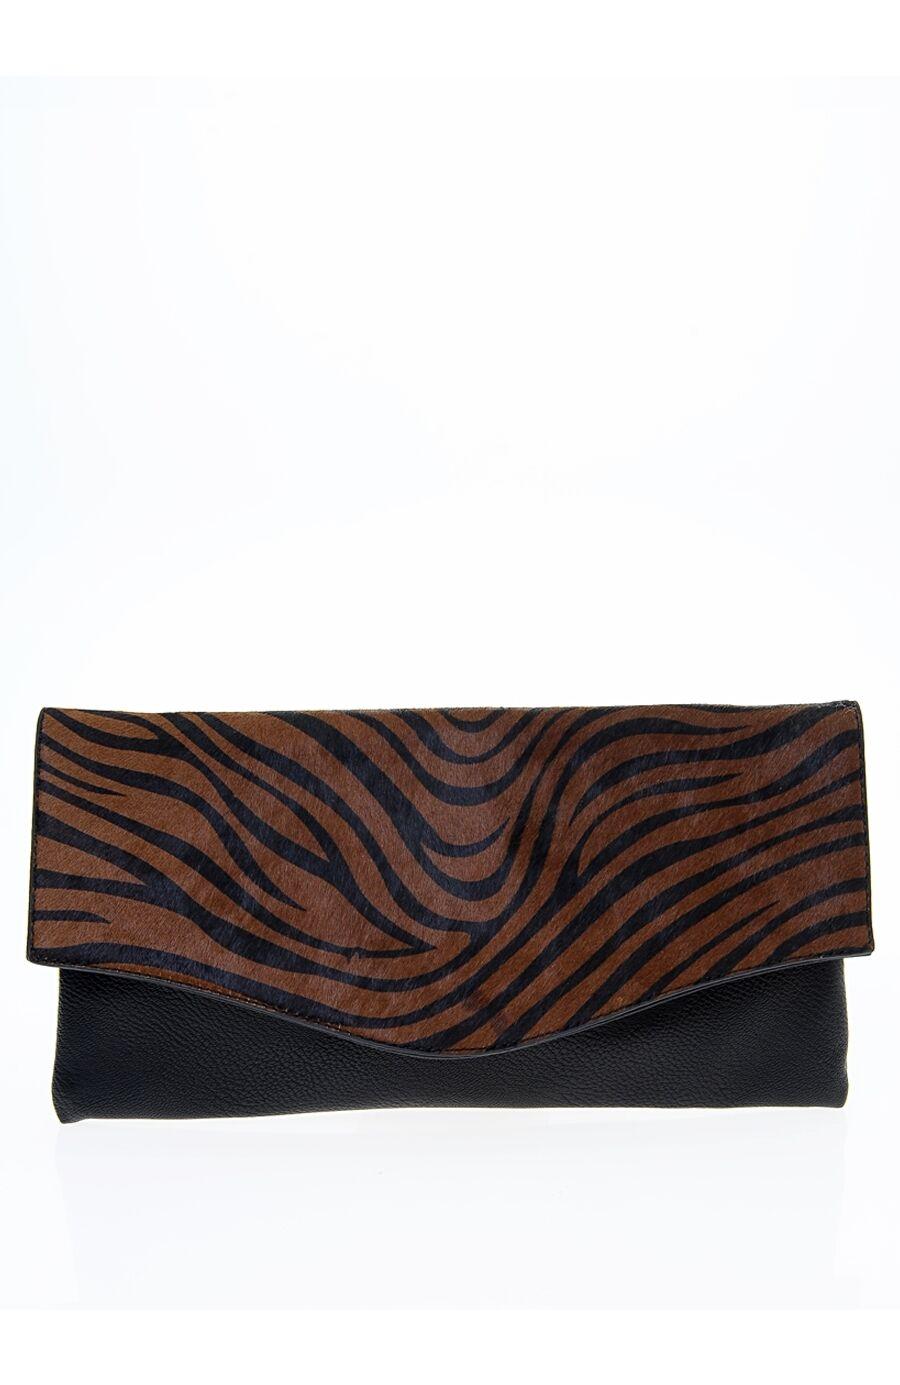 Dıvarese Siyah Clutch Çanta – 69.0 TL